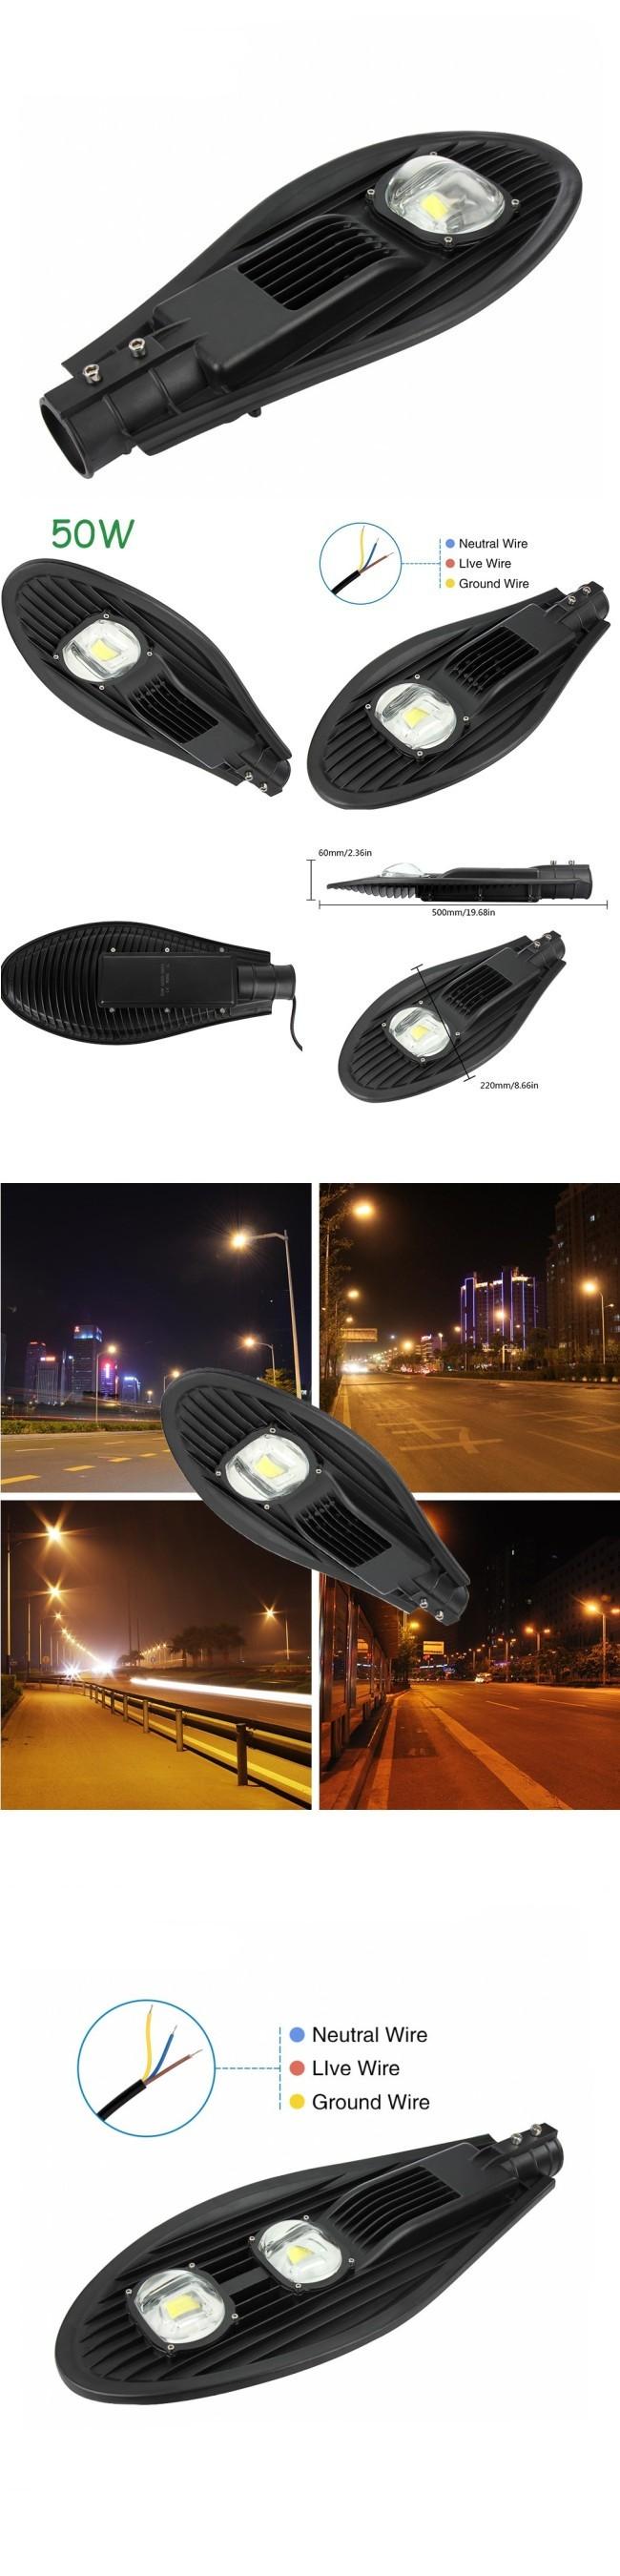 10kv Surge Protection Bridgelux Chip 100W LED Street Lamp Outdoor IP65